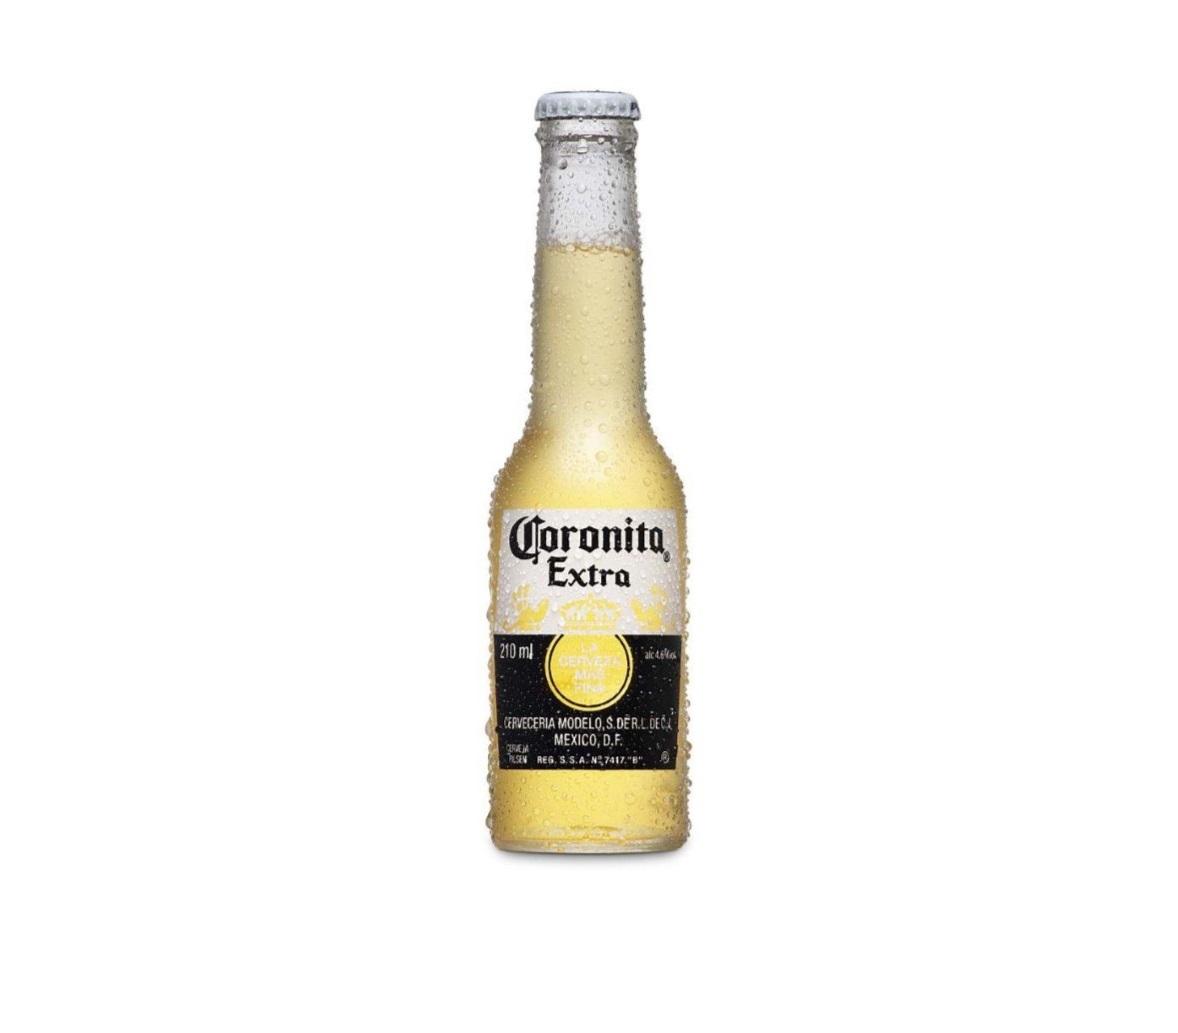 Coronita Extra 210ml Bottles Case Of 24 Australian Liquor Suppliers